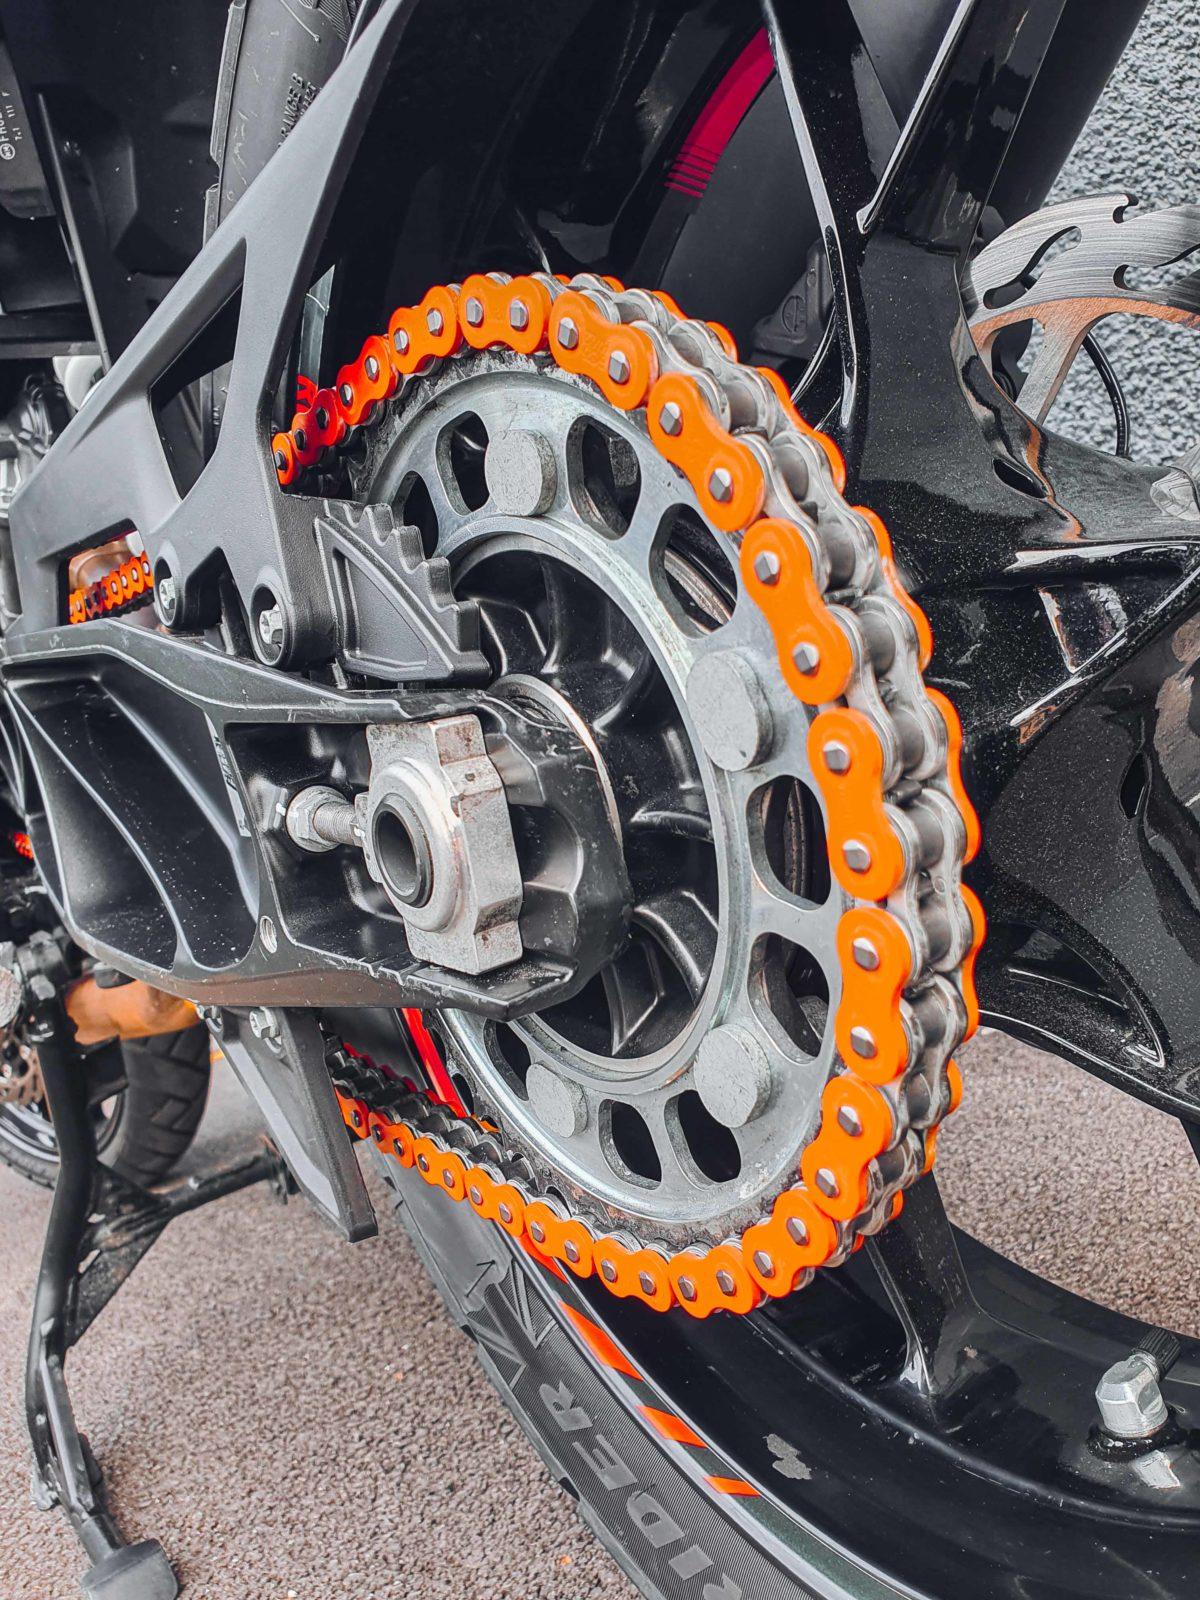 EK 525 MVXZ2 120 links chain - Orange - for ktm adventure super adventure and super duke Bagoros Perfromance chain